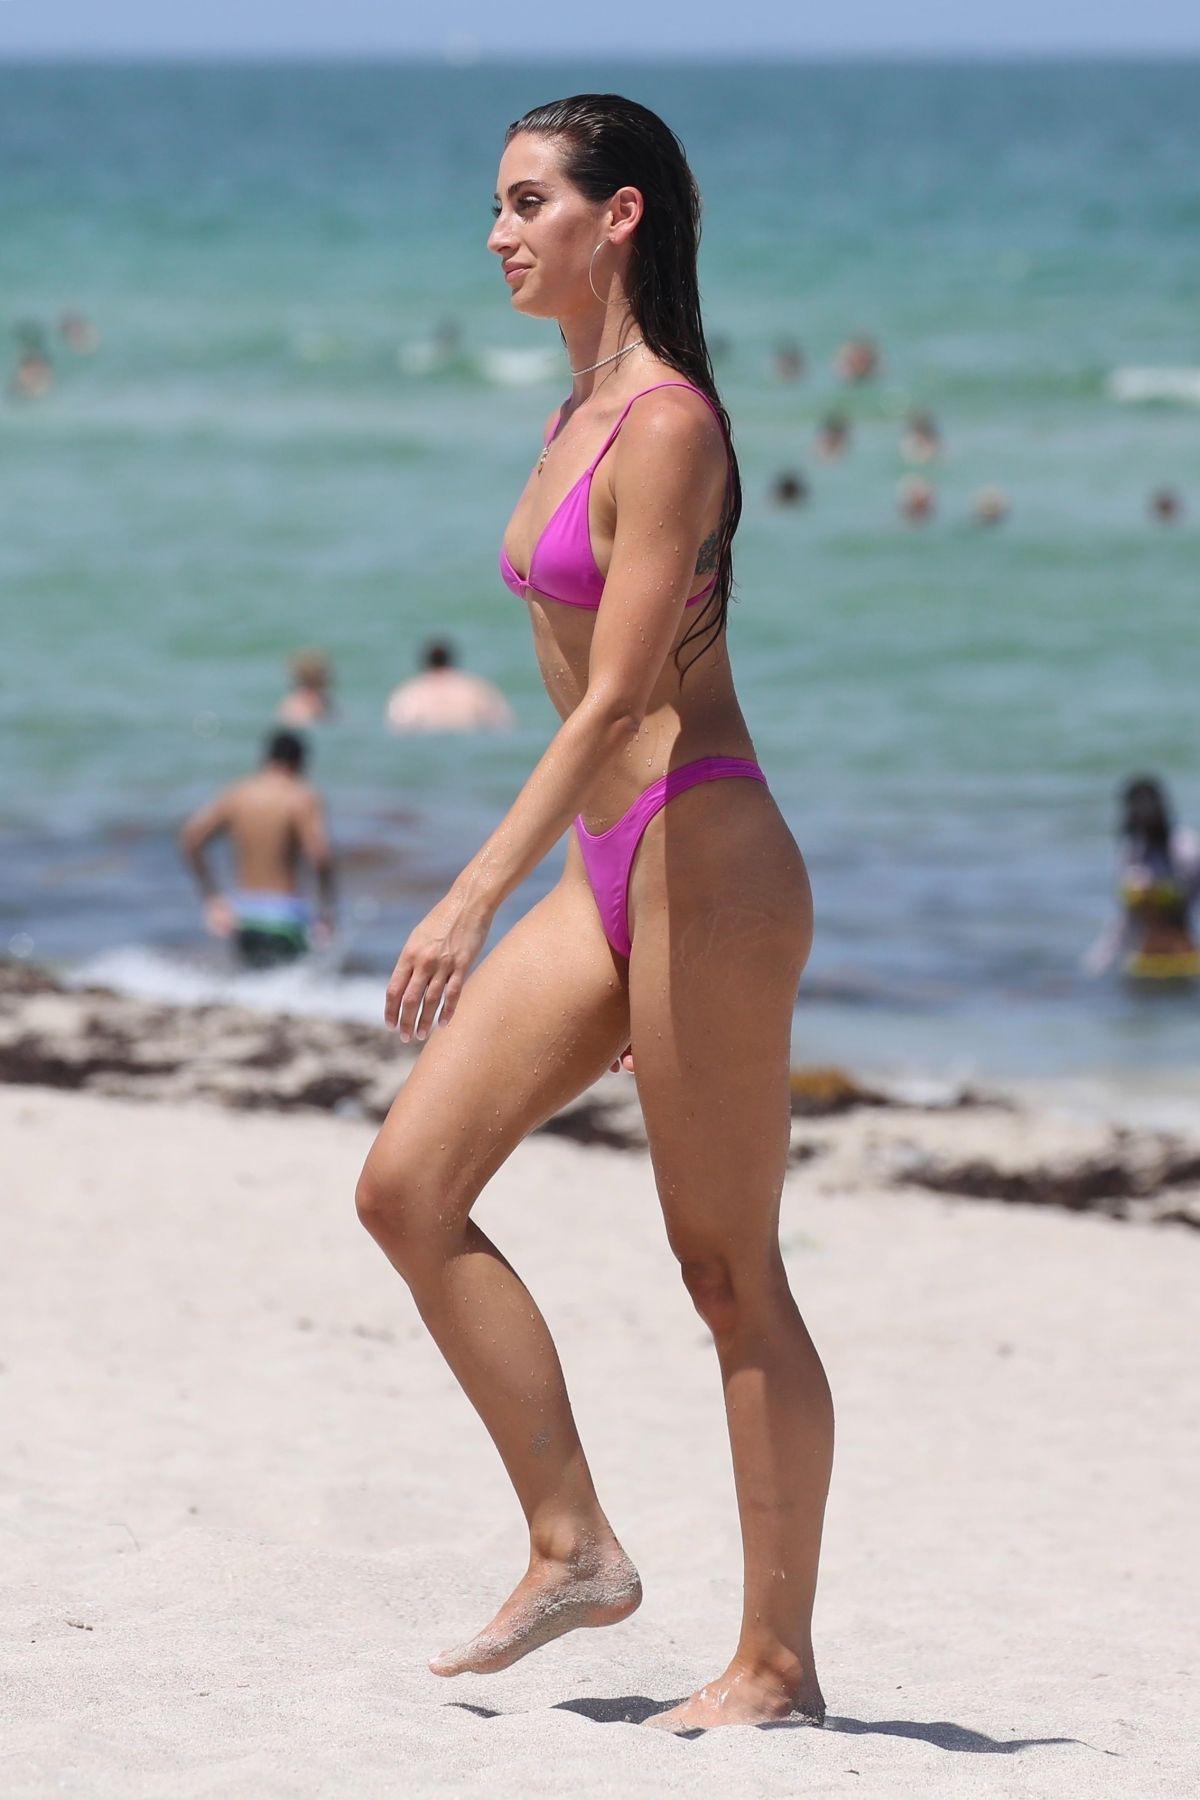 Celebrity Britt Rafuson nudes (23 foto and video), Tits, Fappening, Twitter, legs 2019